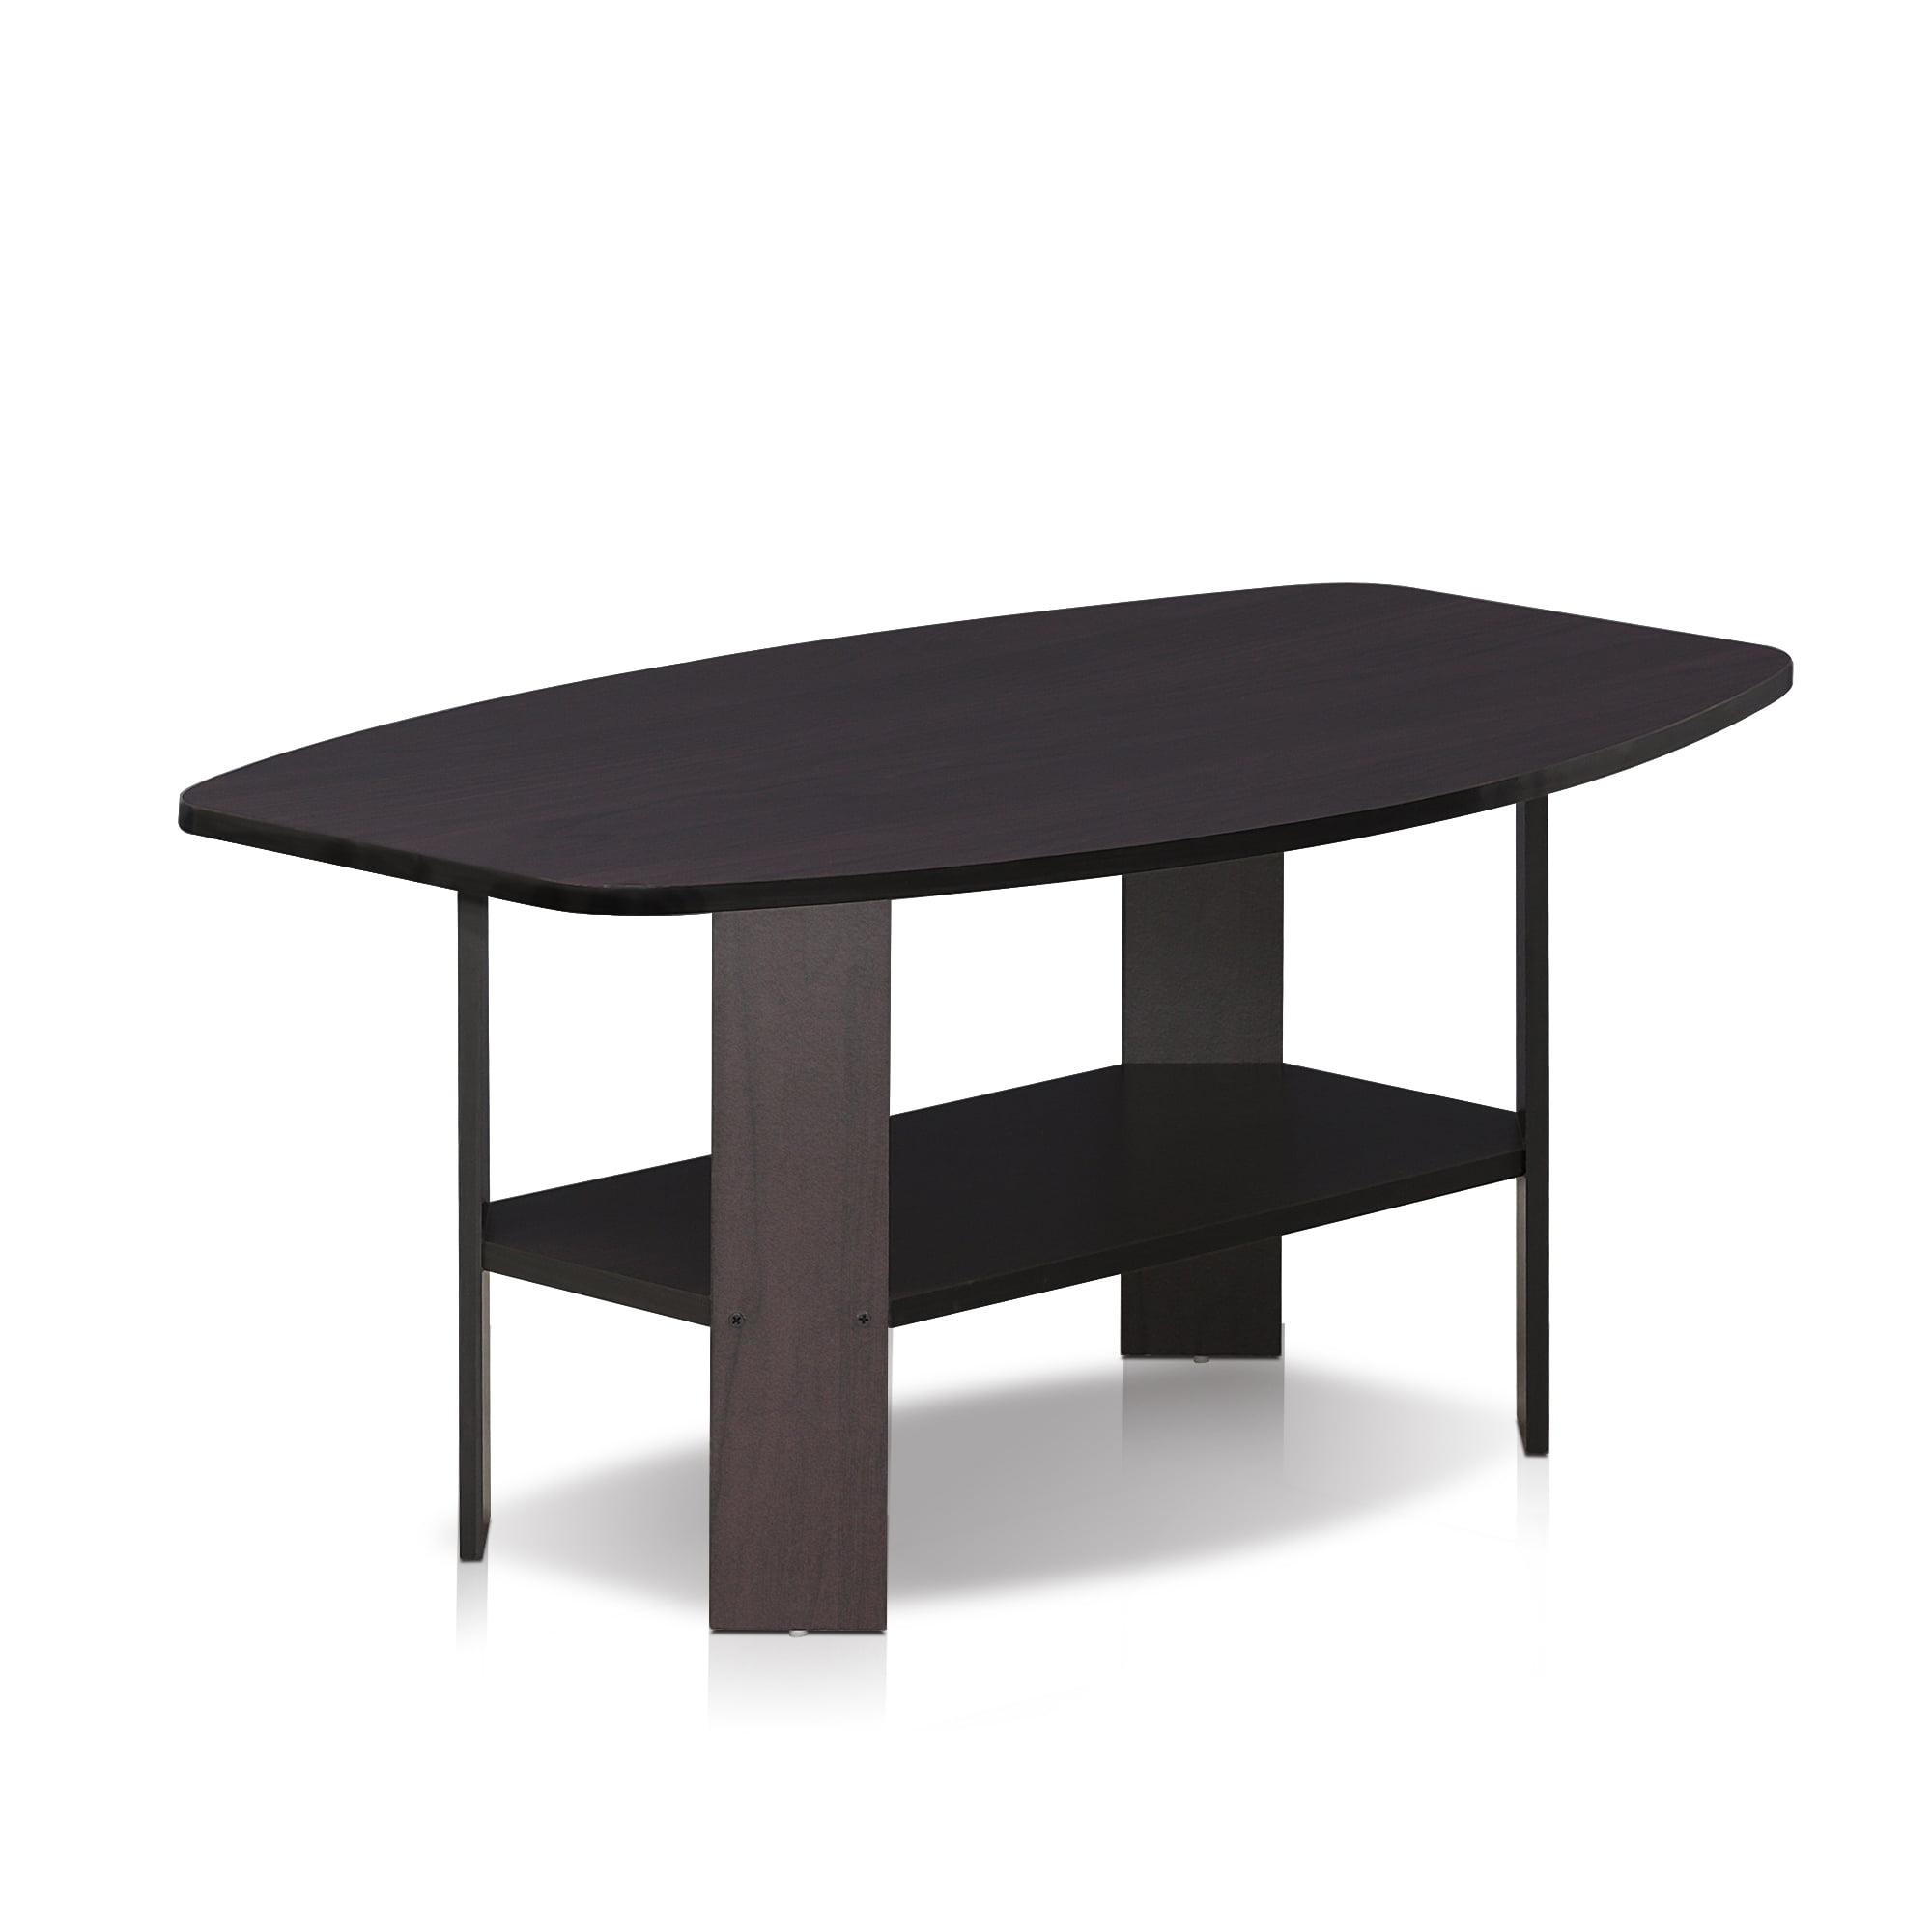 - Furinno 11179 Simple Design Coffee Table - Walmart.com - Walmart.com